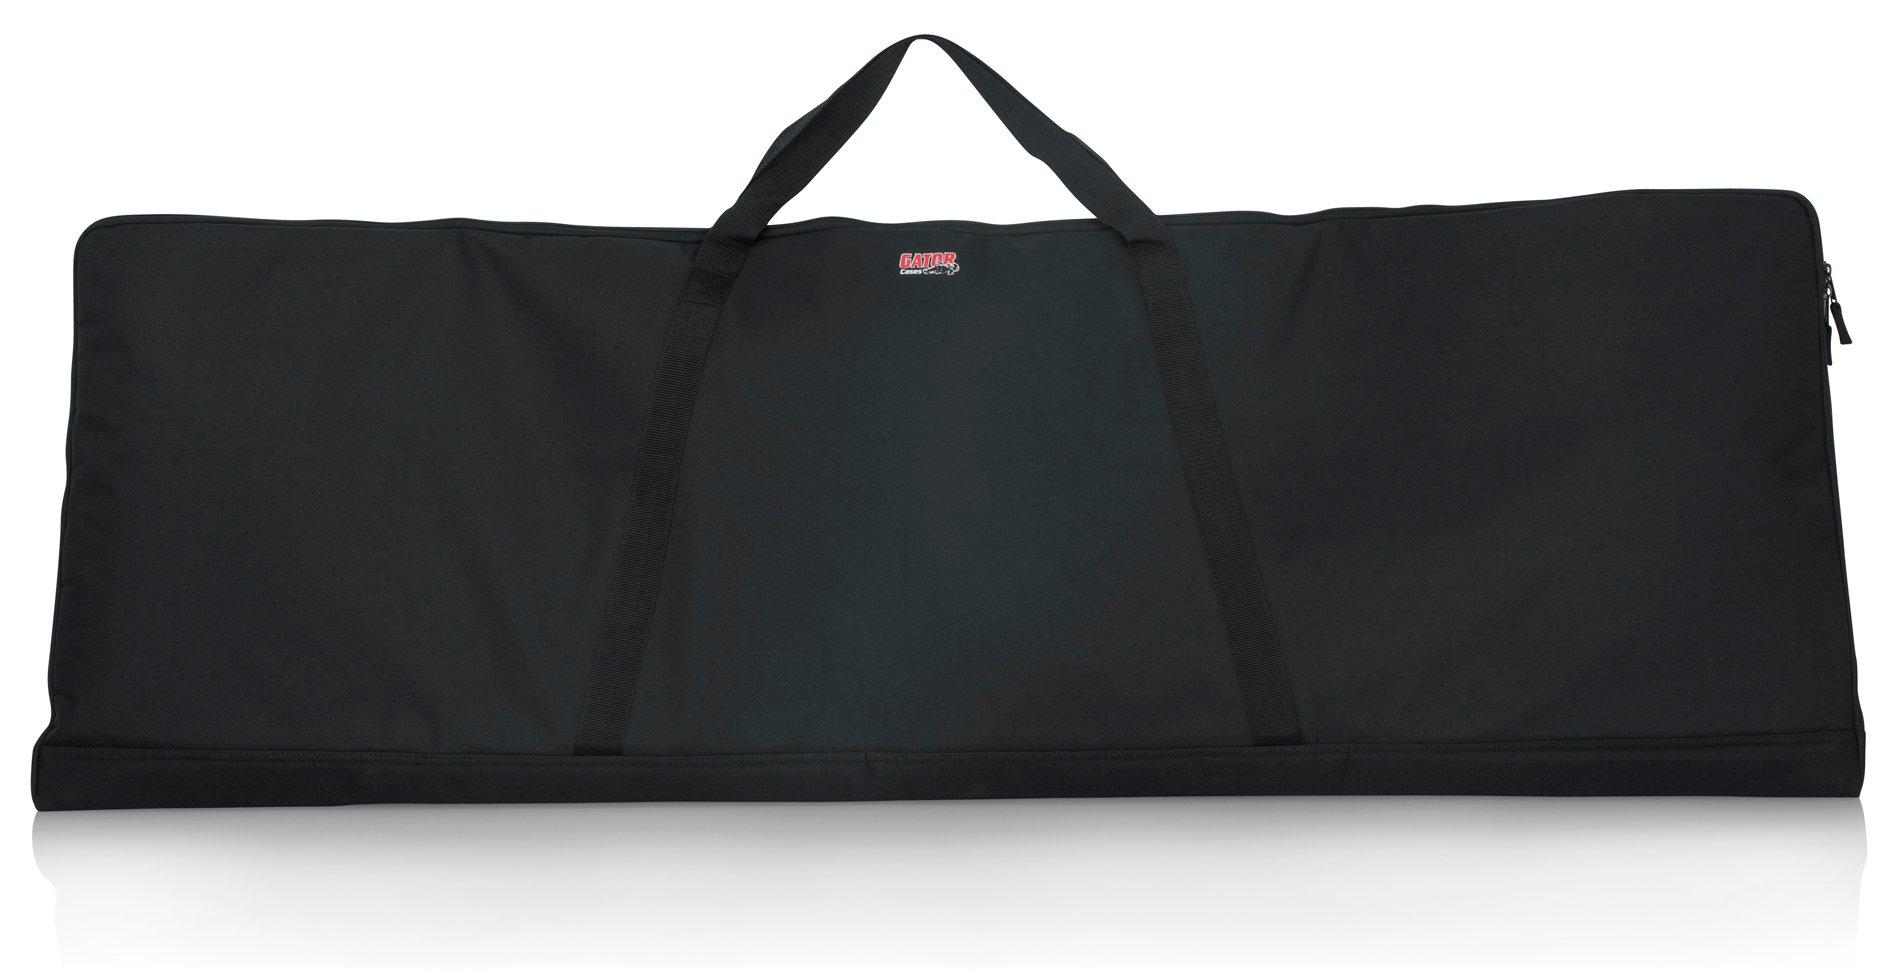 Gator Cases GKBE-88 Economy 88 Note Keyboard Gig Bag GKBE-88